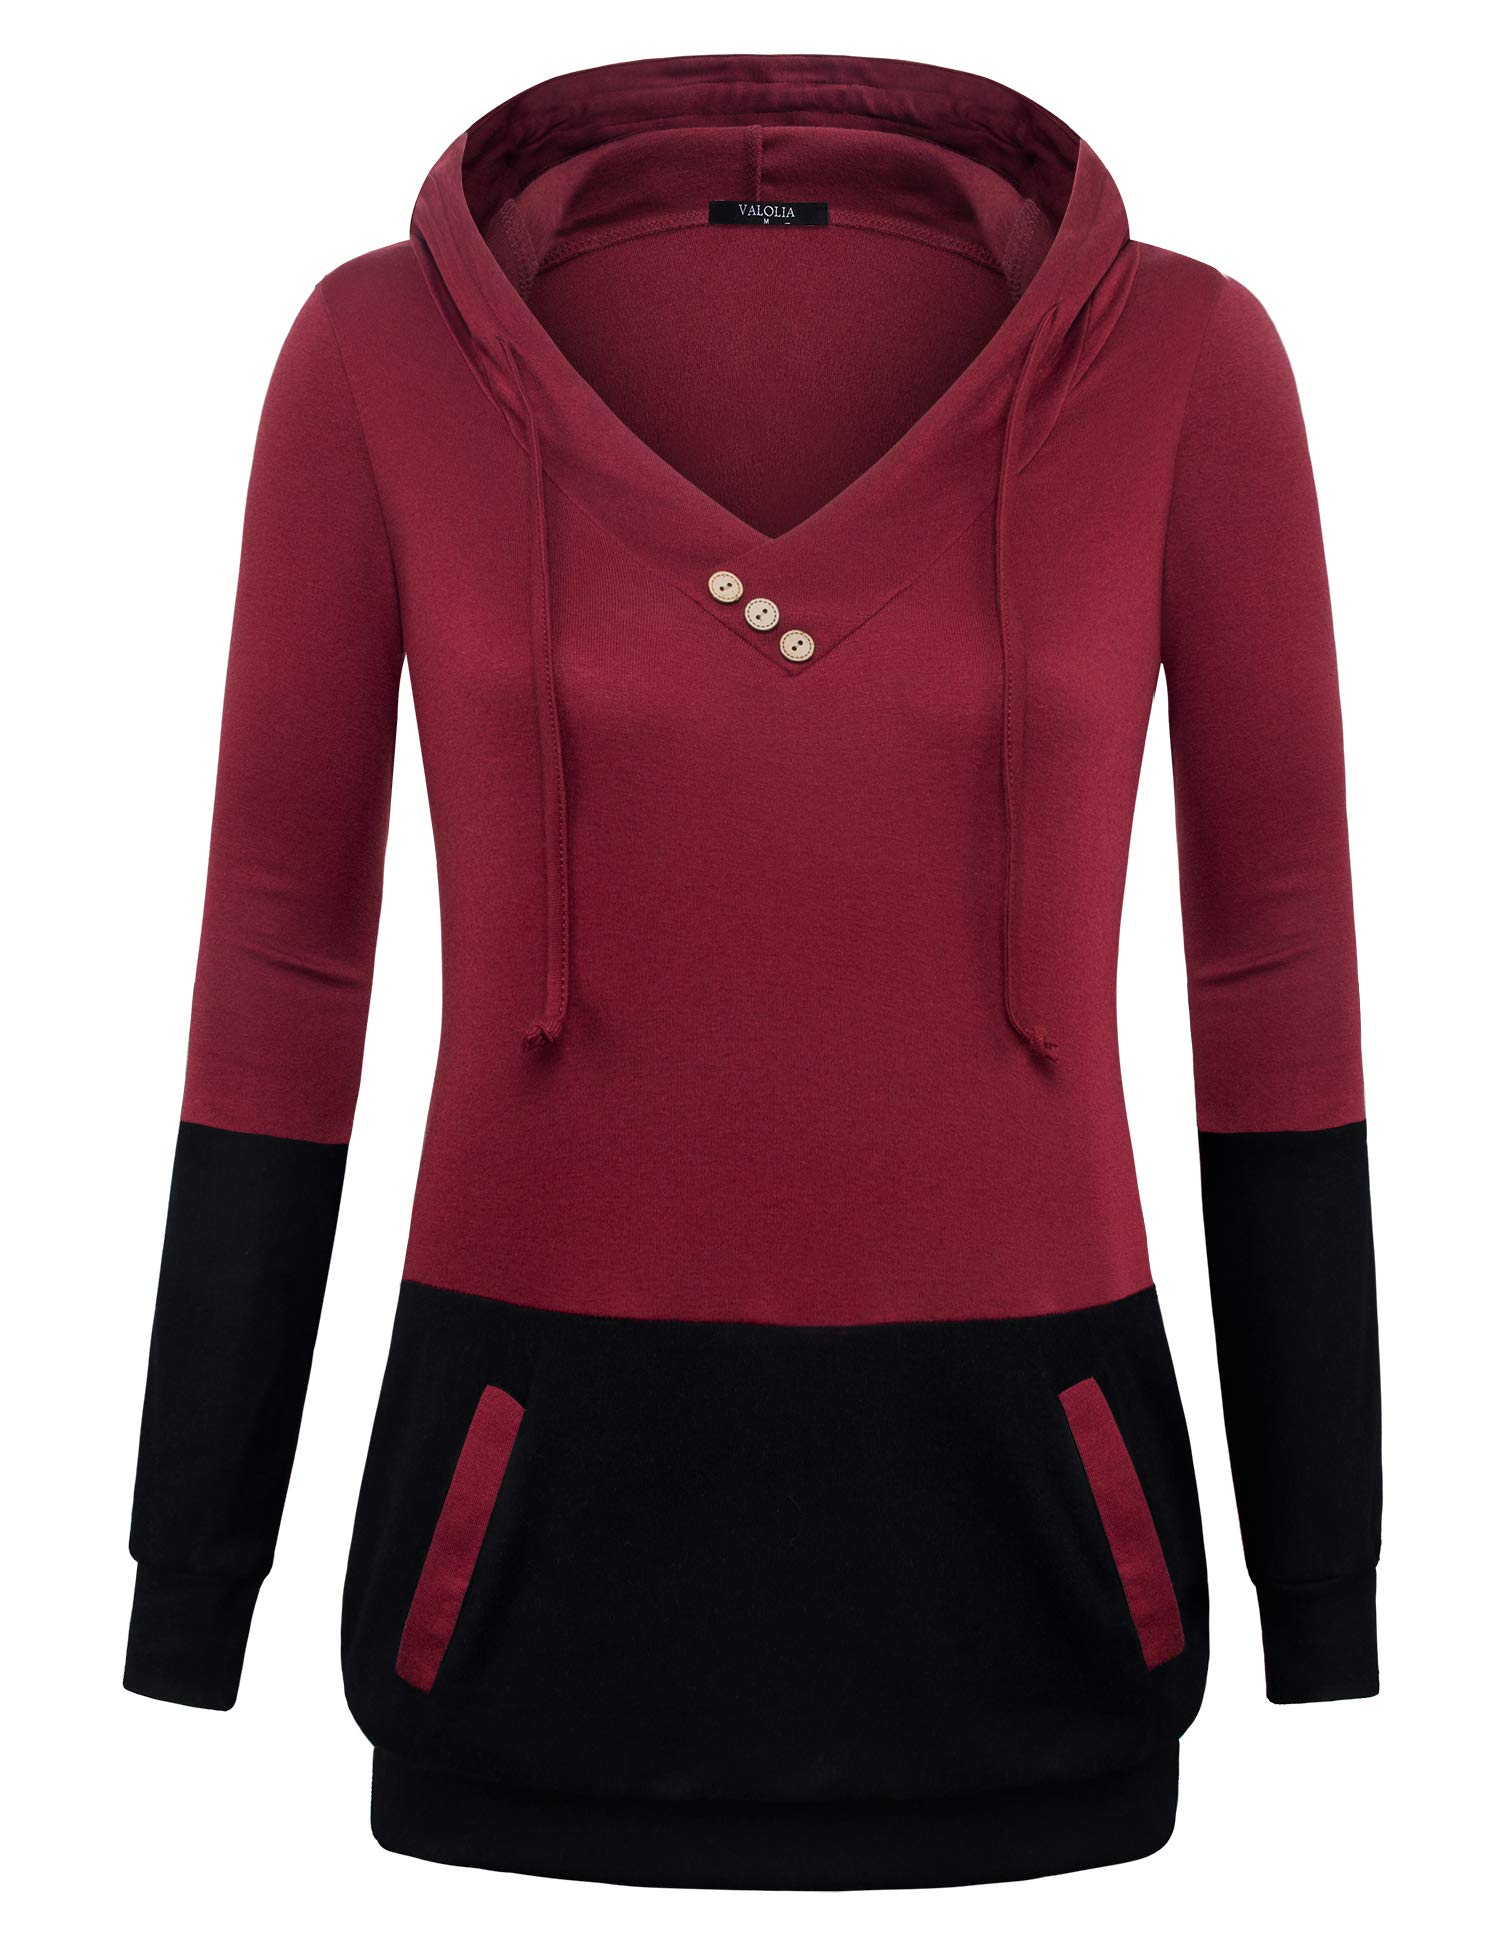 VALOLIA Tunics Sweatshirt for Women, Long-Sleeved Classic Pullover Hoody Sweater Lightweight Thin Tops Wine L